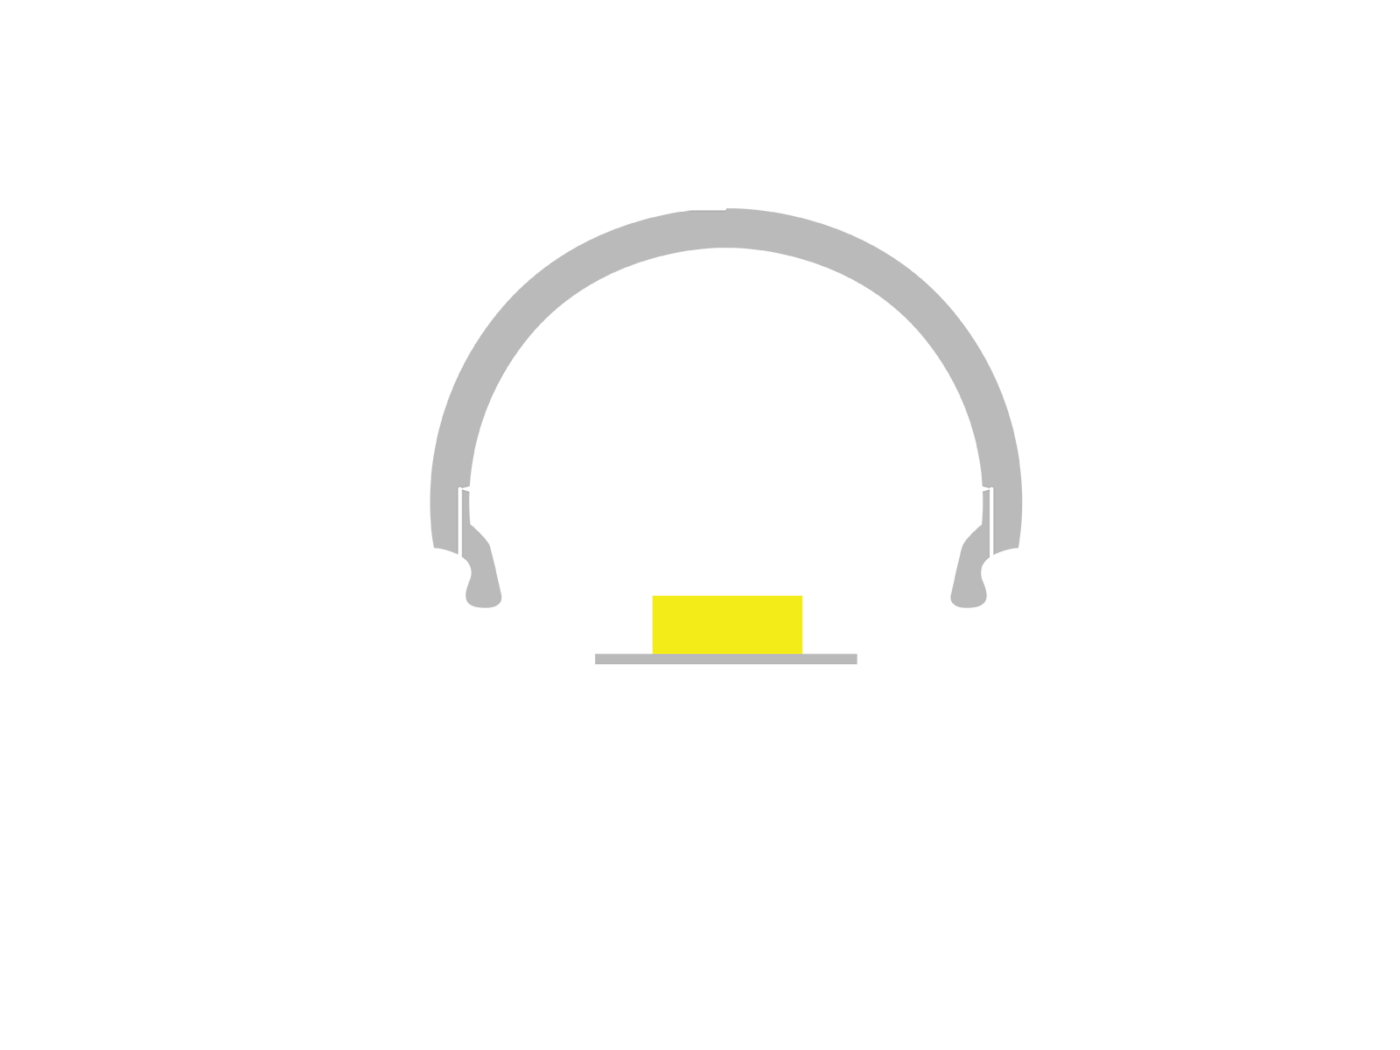 Diagram_Soho180RL_1600x1200